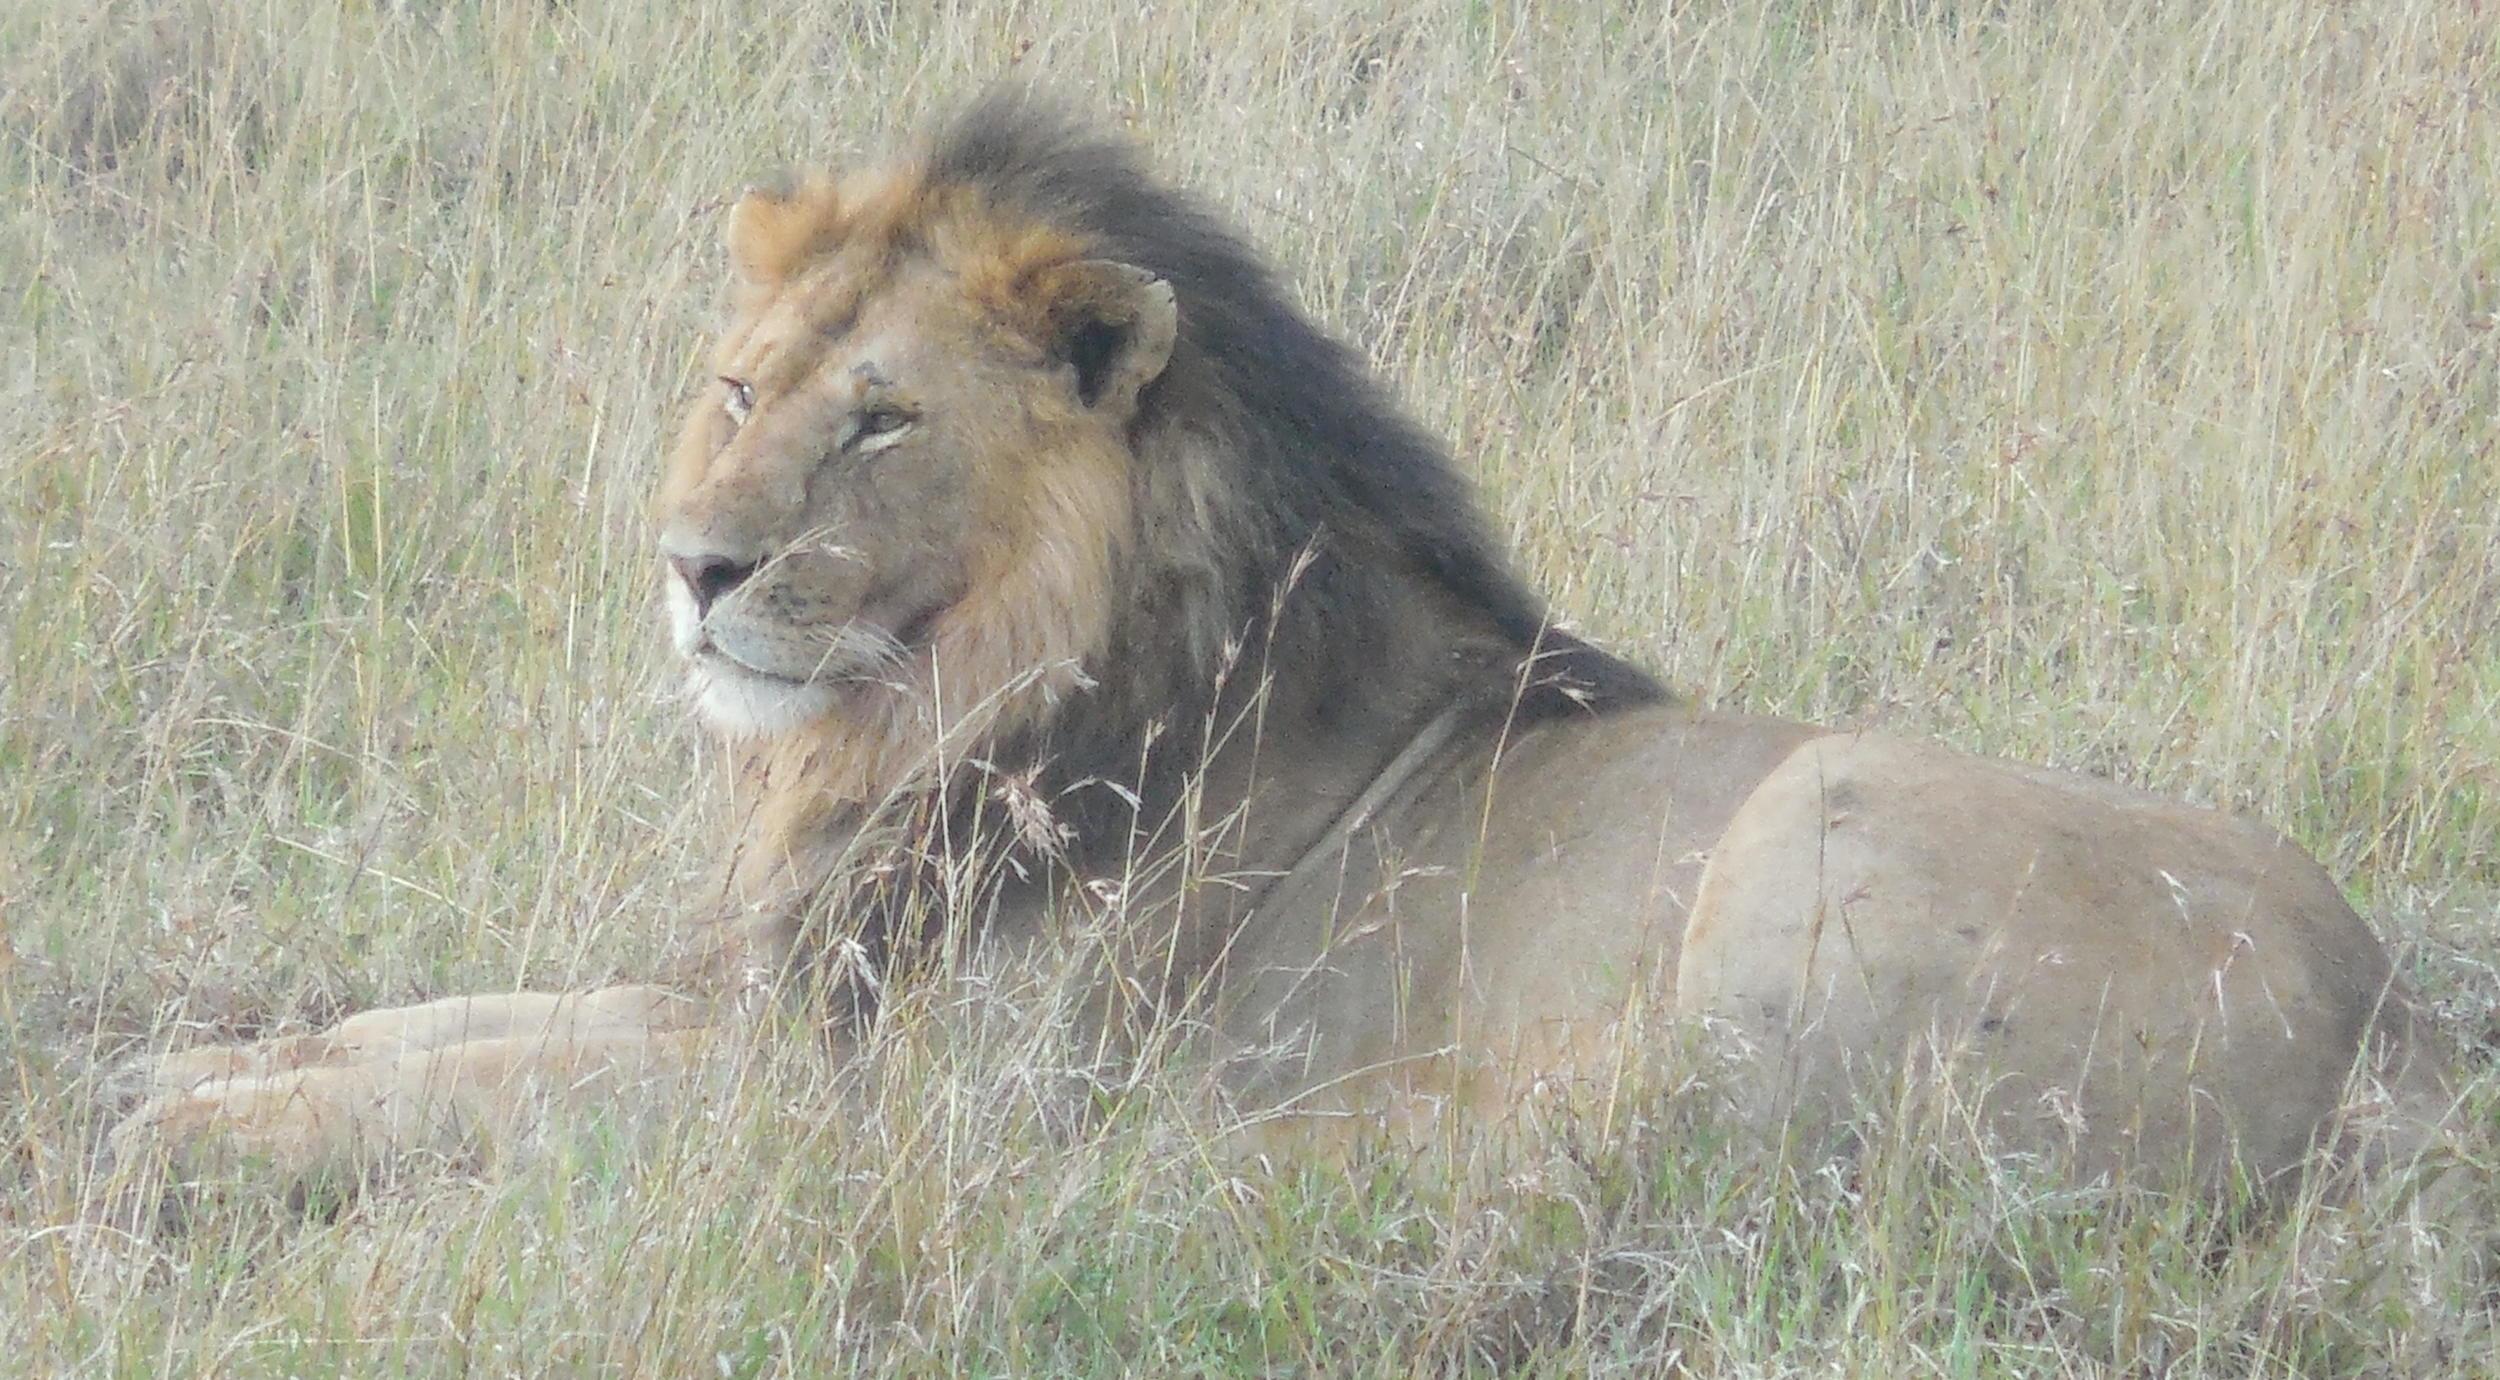 Lion at Masai Mara in Kenya 2014 © Flyga Twiga LLC